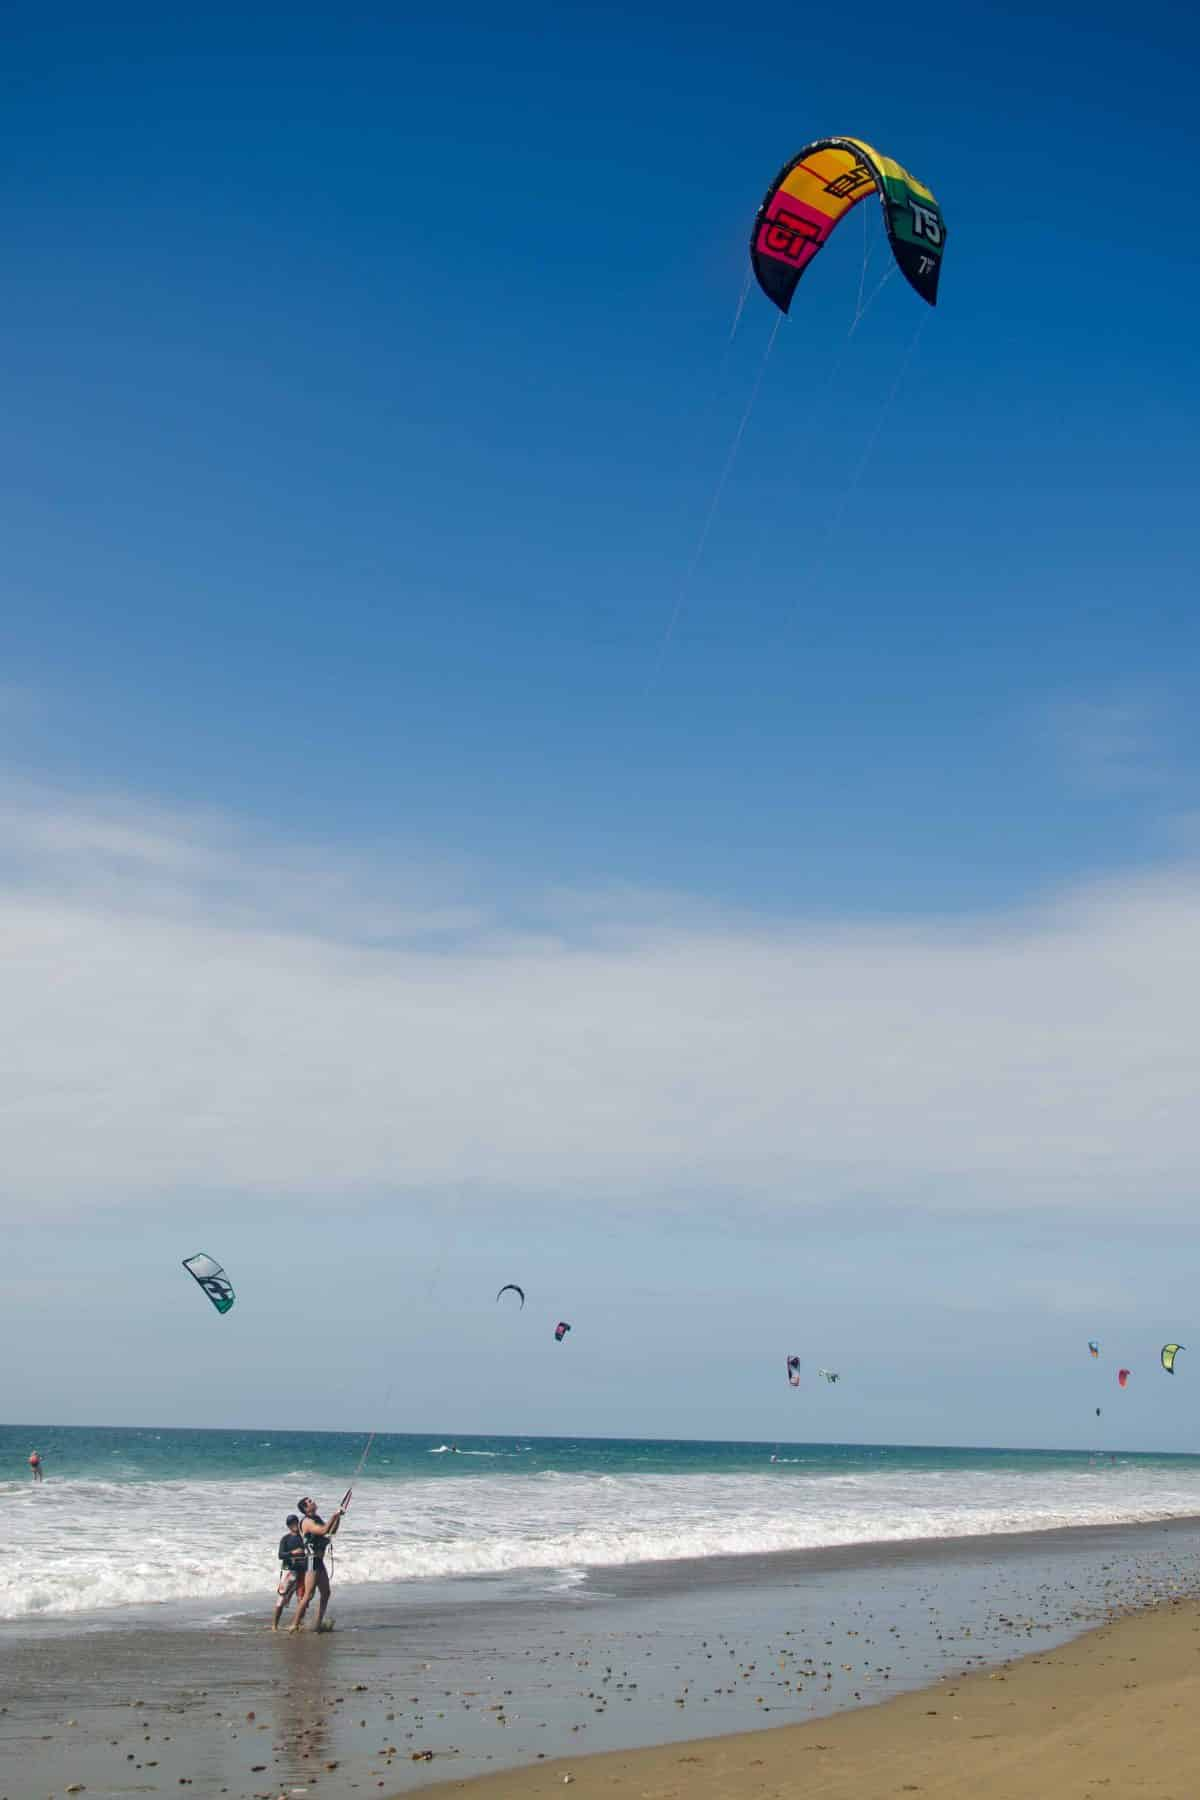 Windsurfing in Santa Marianita, Ecuador | ©Angela Drake / Not Your Average American